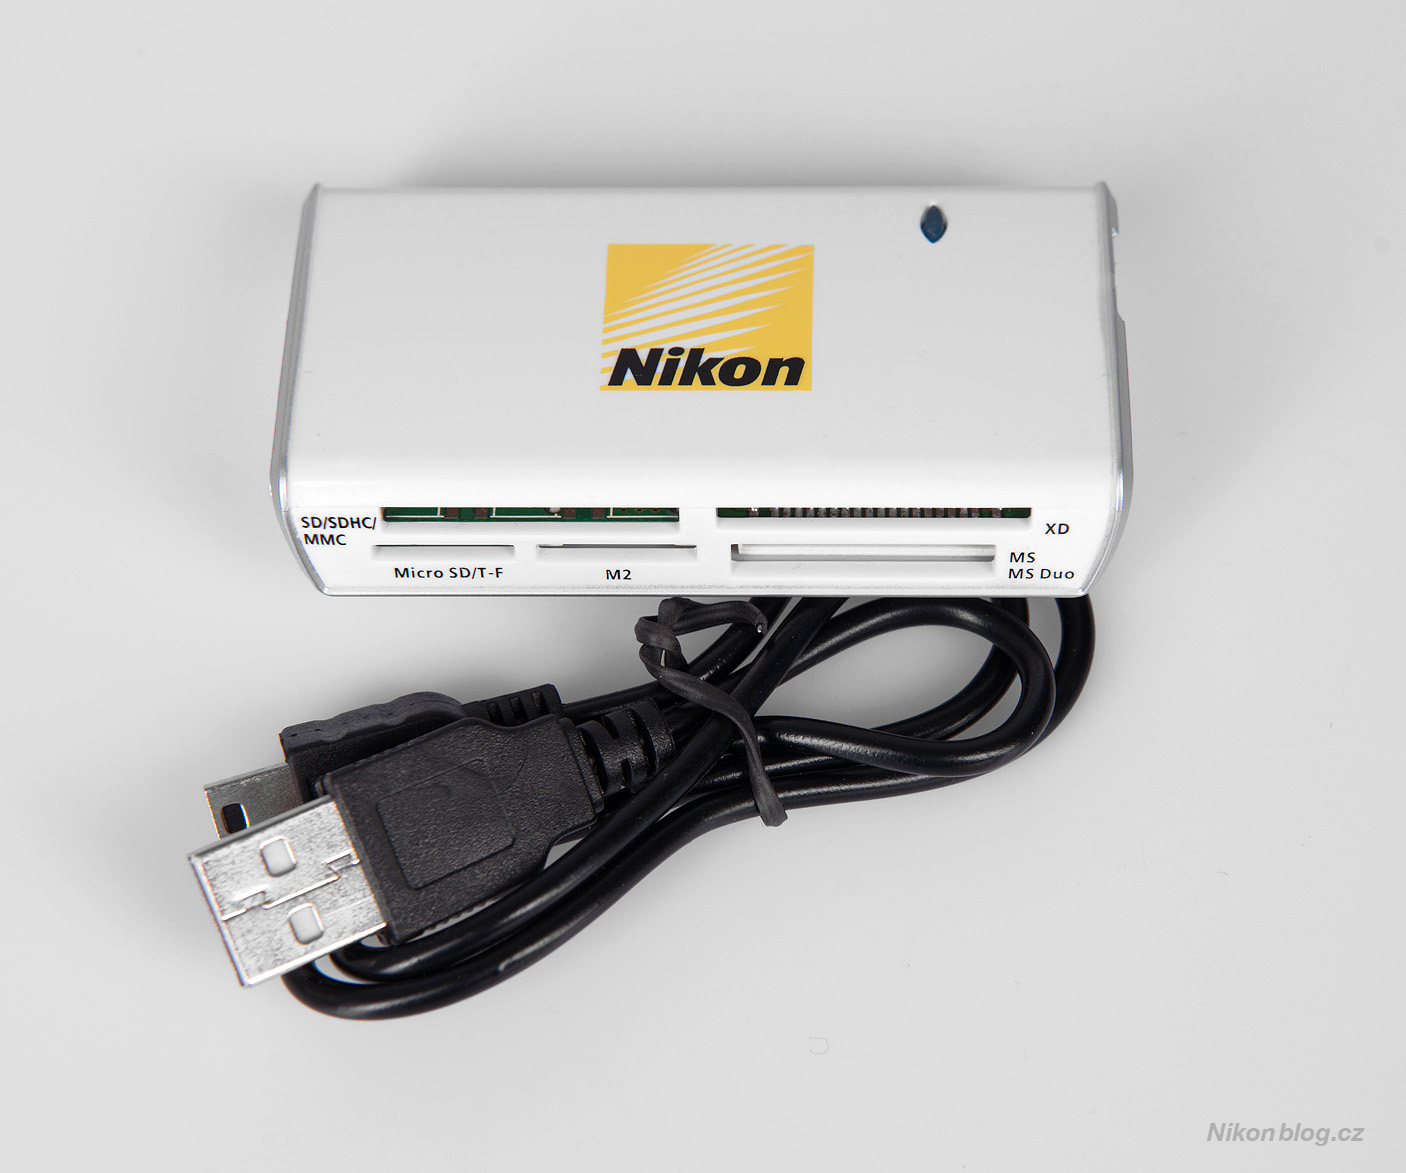 Čtečka karet Nikon